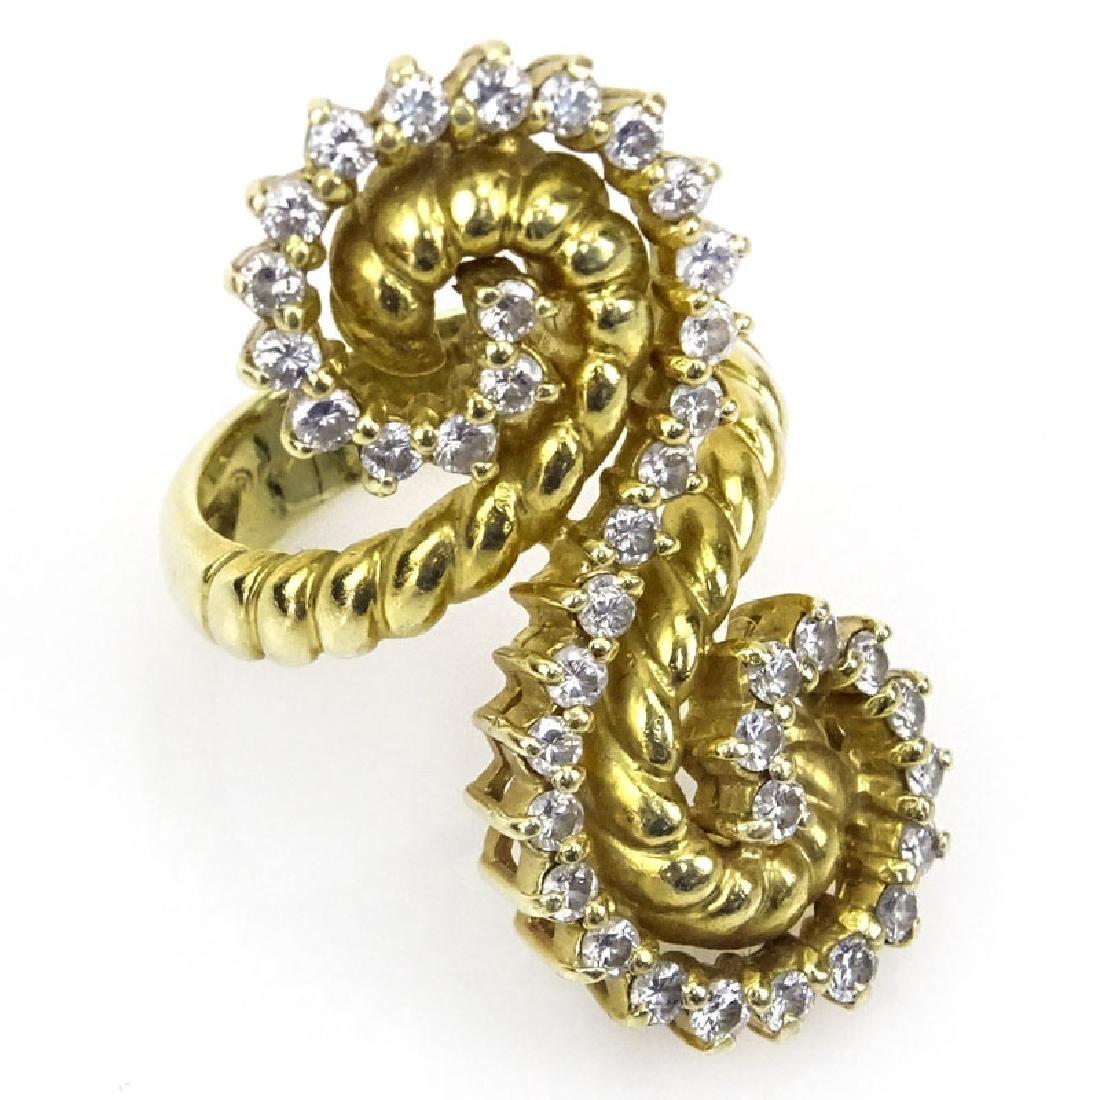 Retro 18 Kt Yellow Gold & Round Cut Diamond Spiral Ring